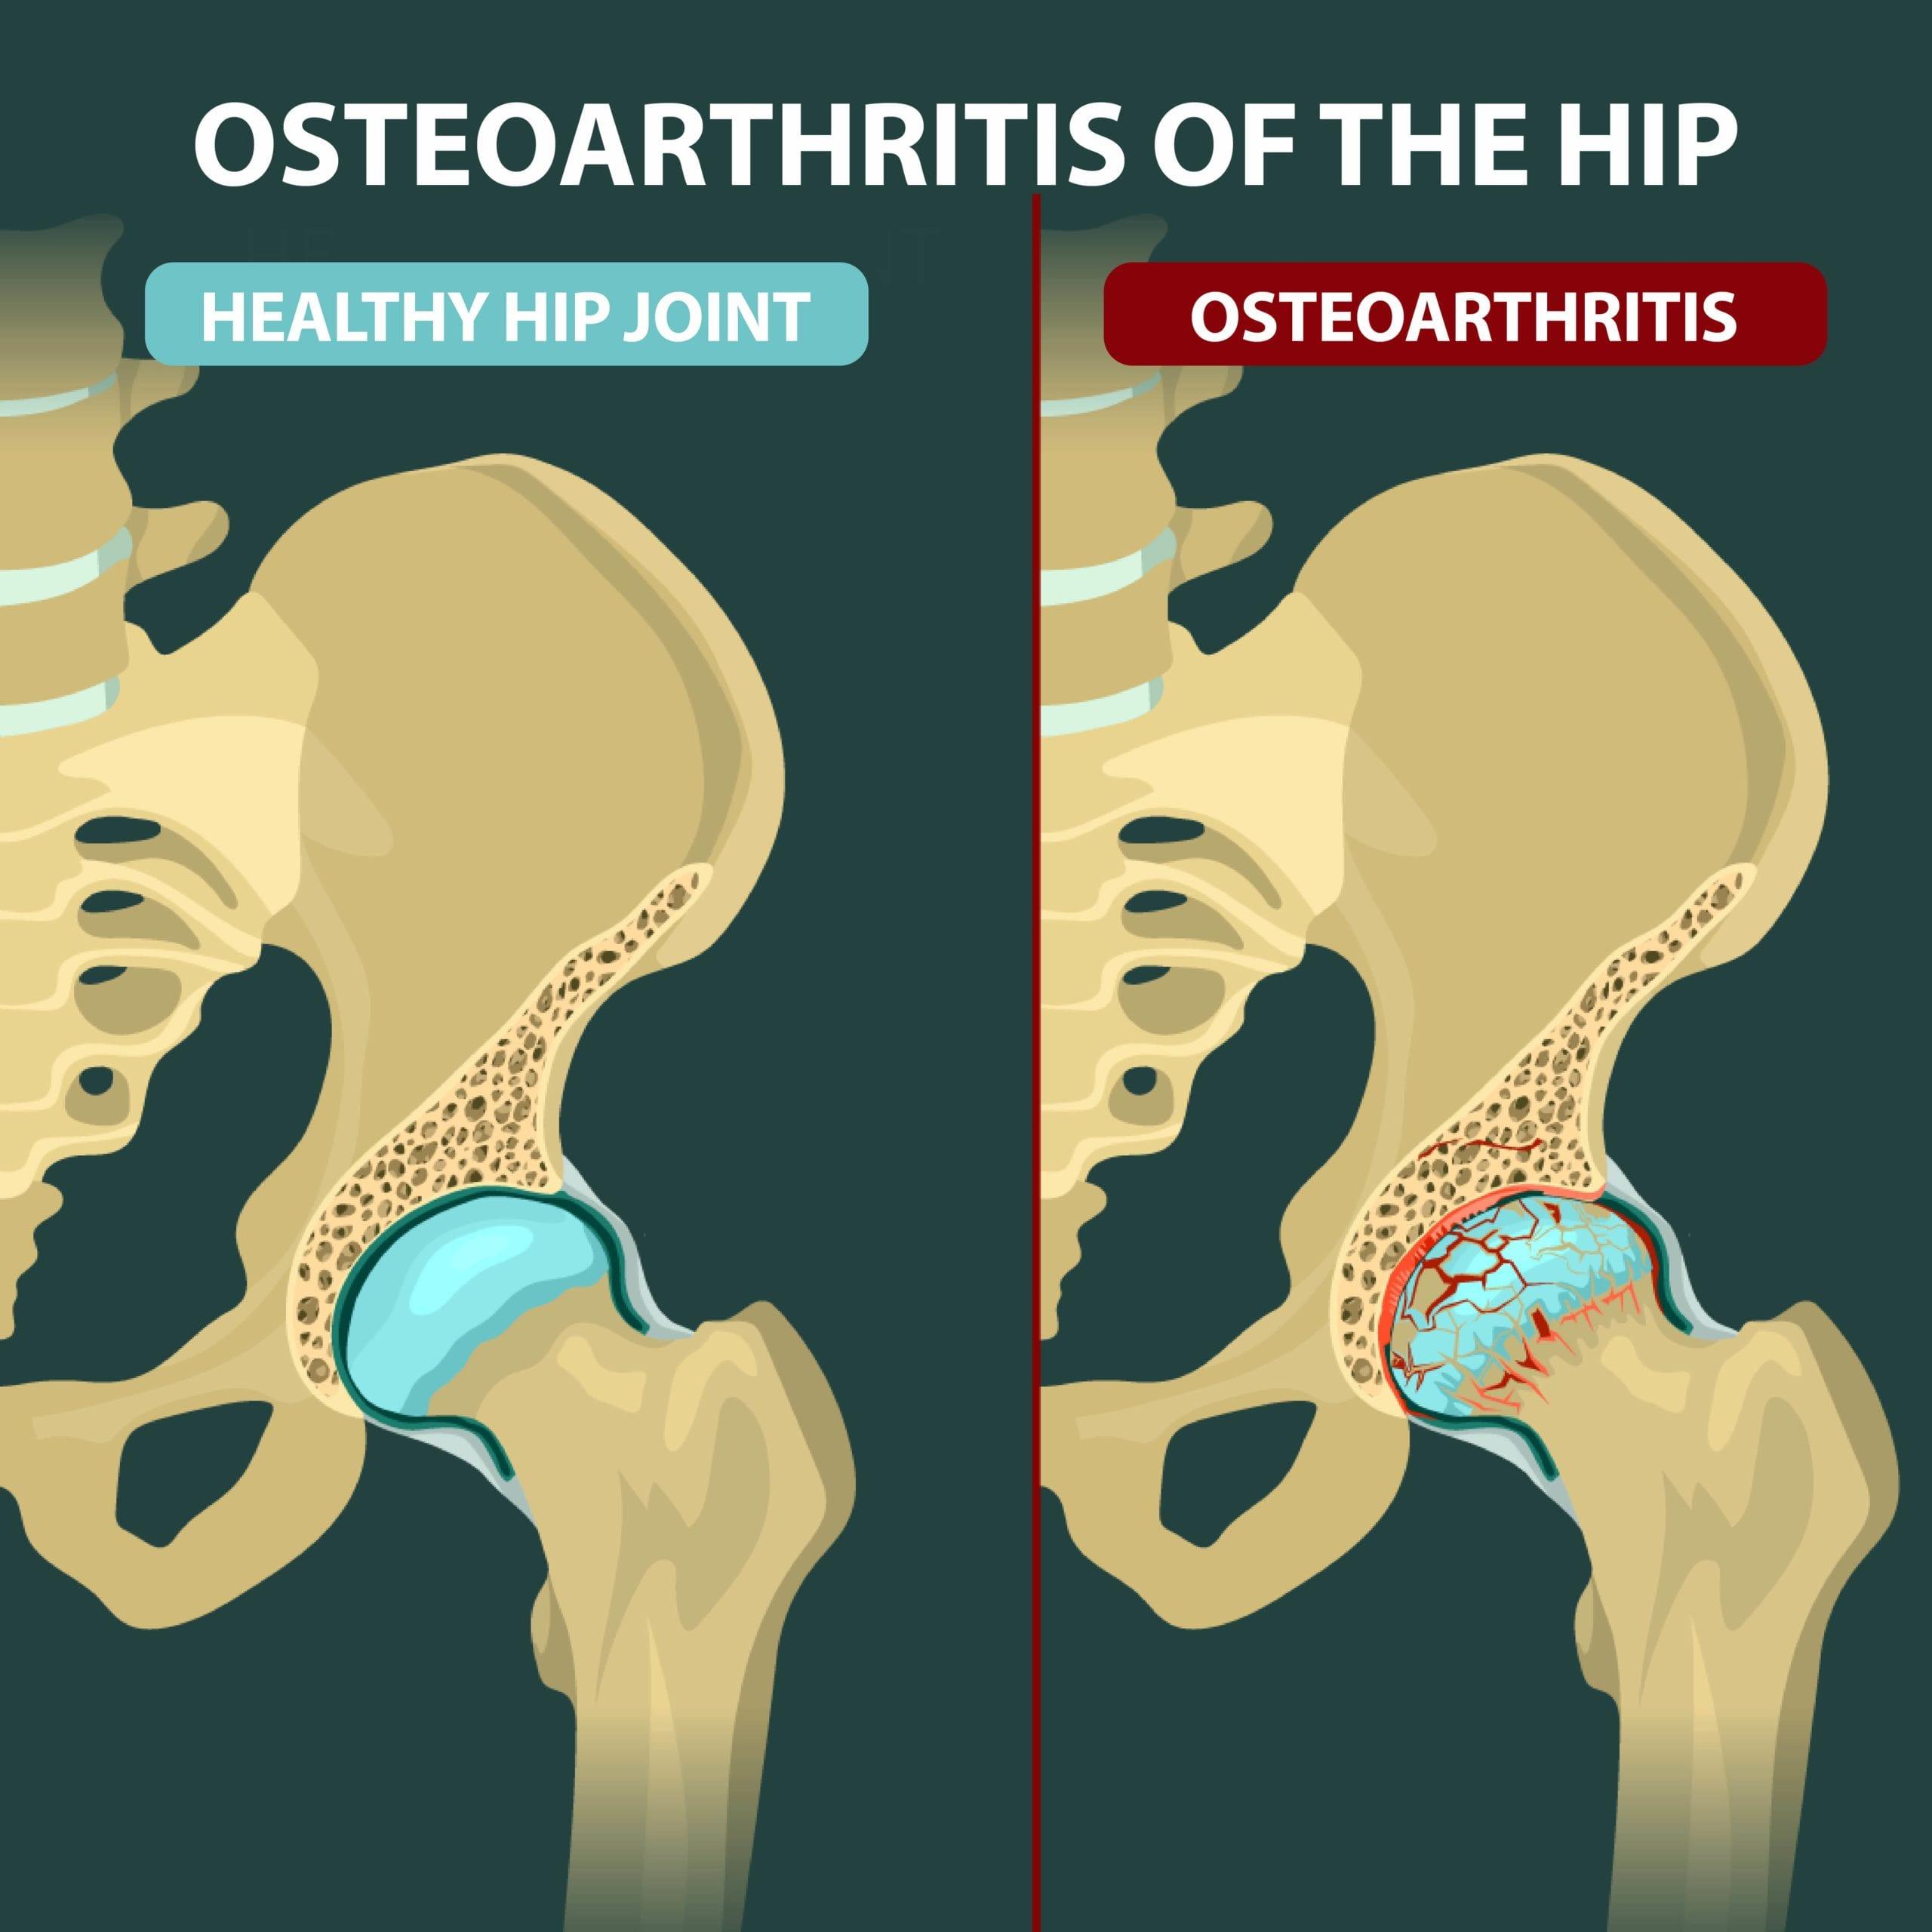 osteoarthritis symptoms hip)